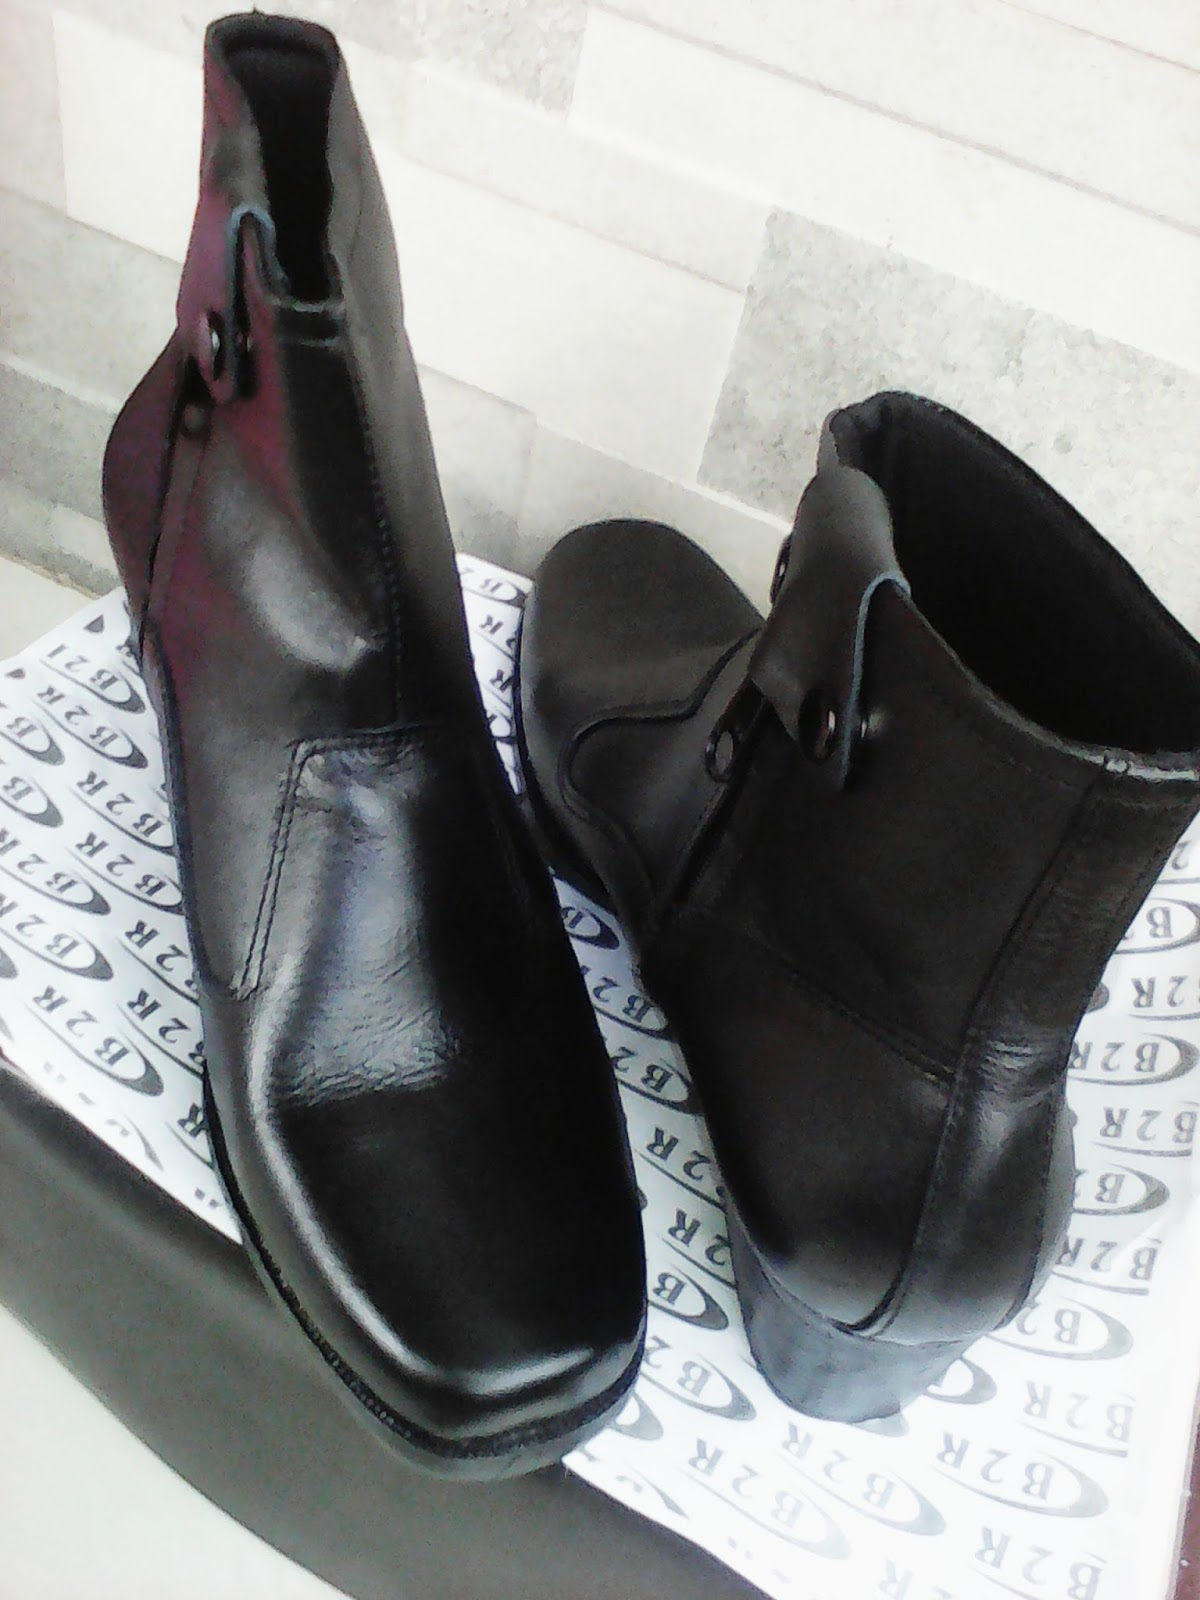 Harga Sepatu Pdh Tni Polri Dan Security Merk B2r Update Januari Tali Ressleting Mengkilap Zona Murah